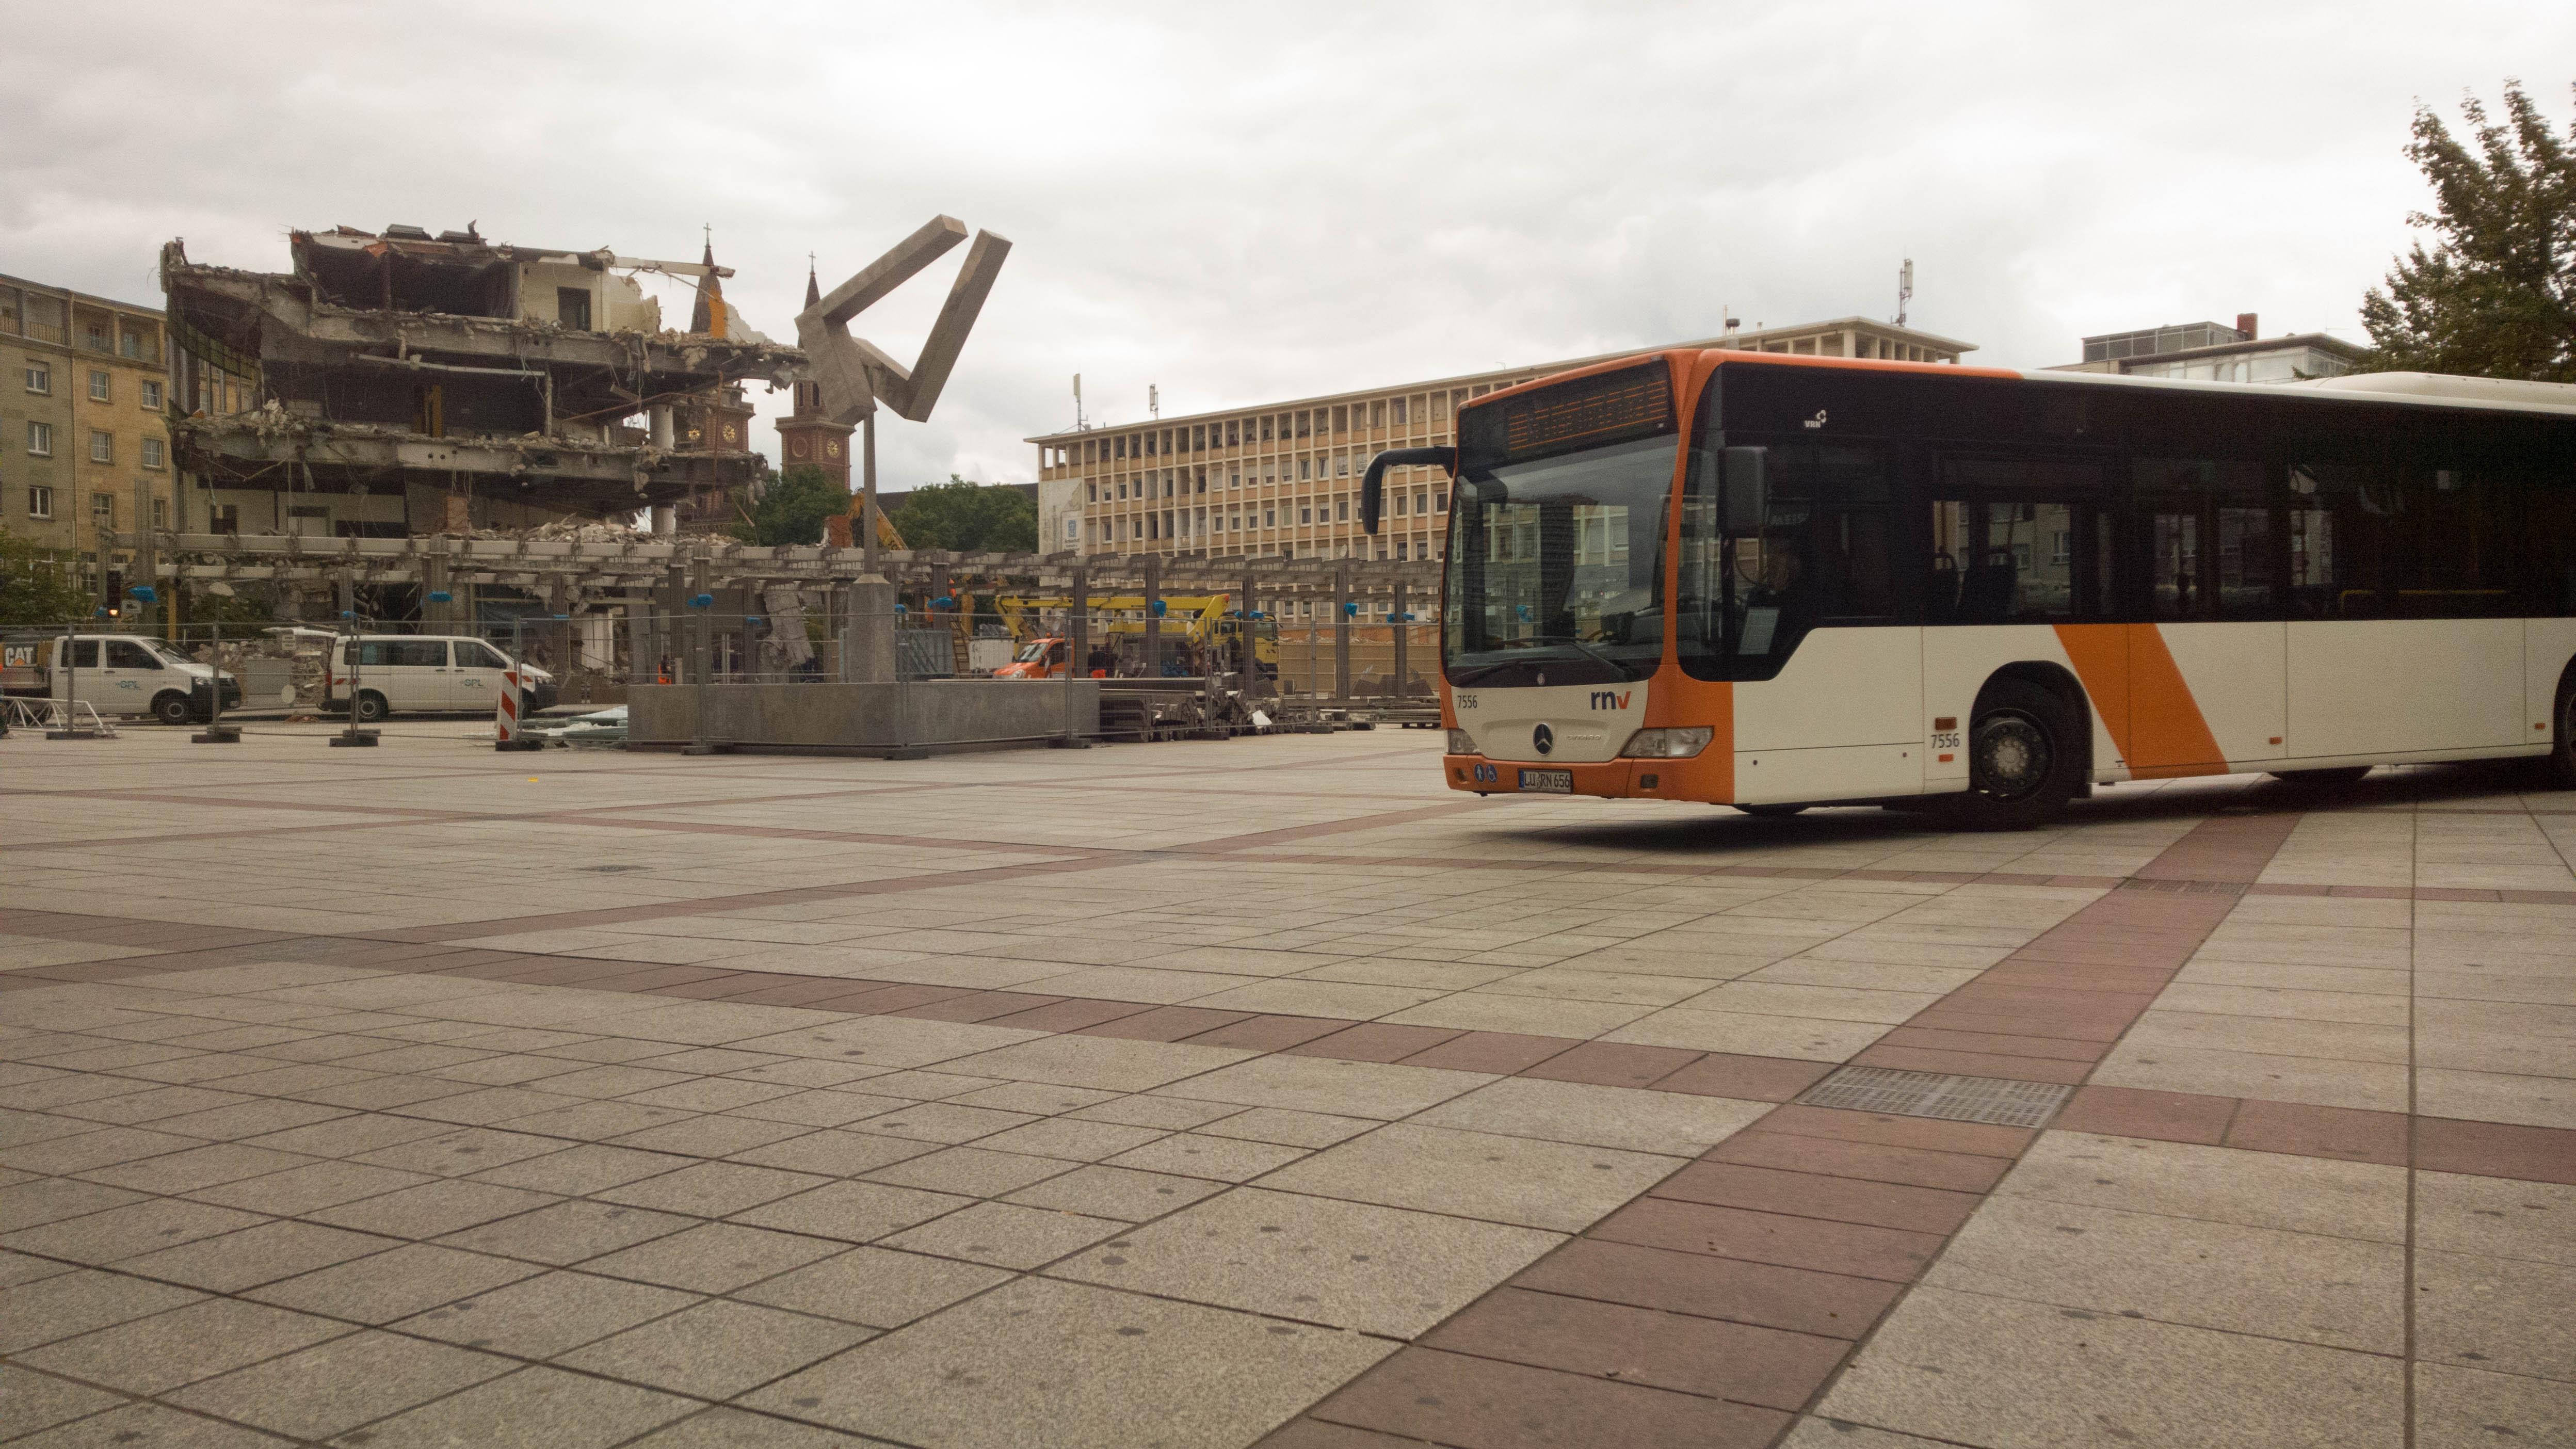 Nokia Lumia 1520 Photo Example - Berliner Platz Ludwigshafen